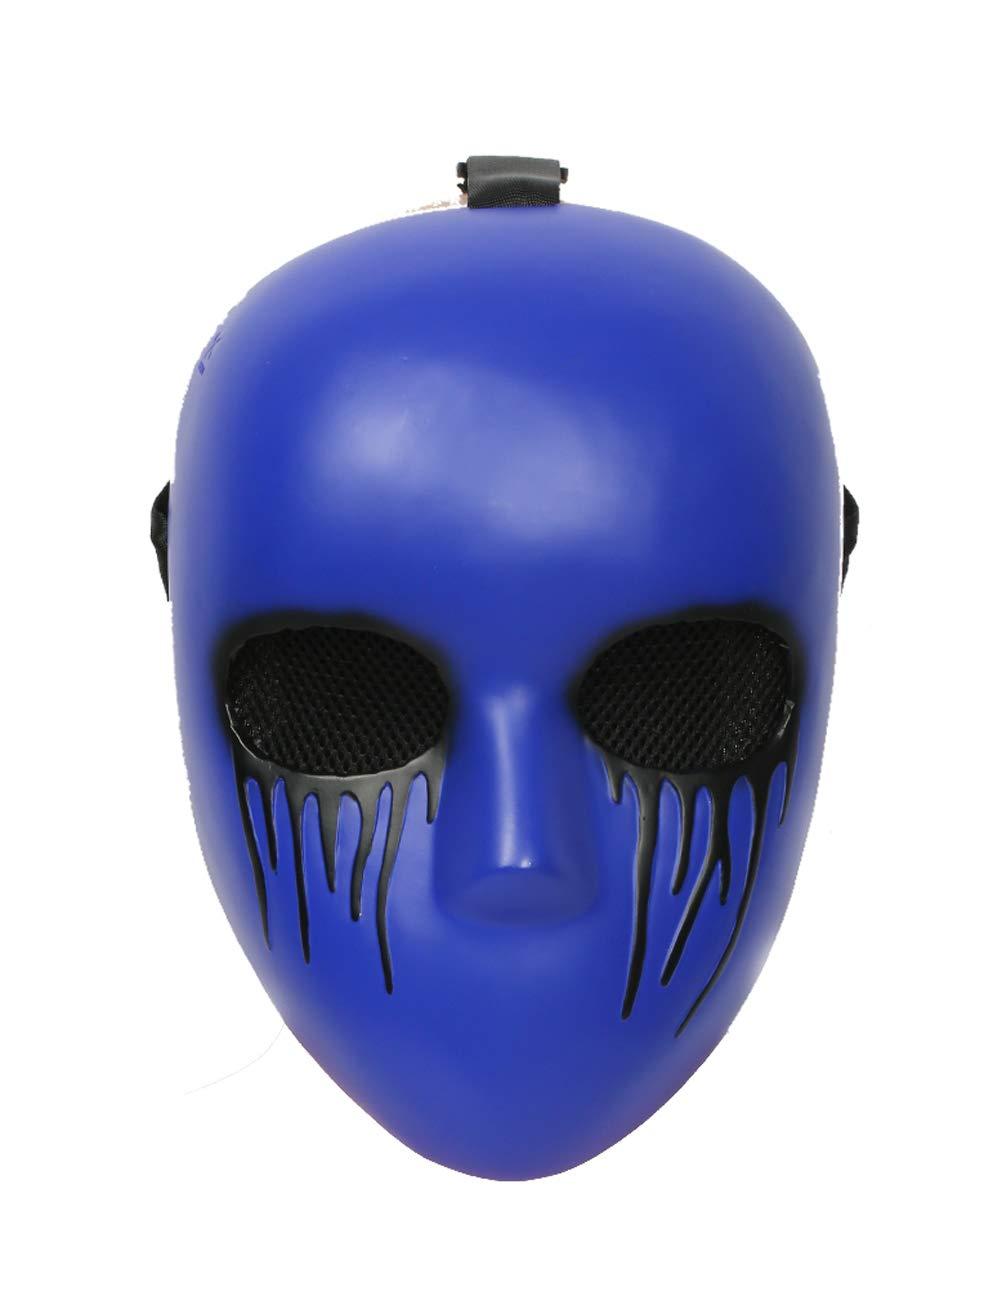 Xcoser Eyeless Jack Mask Costume Props for Halloween Coslay Resin